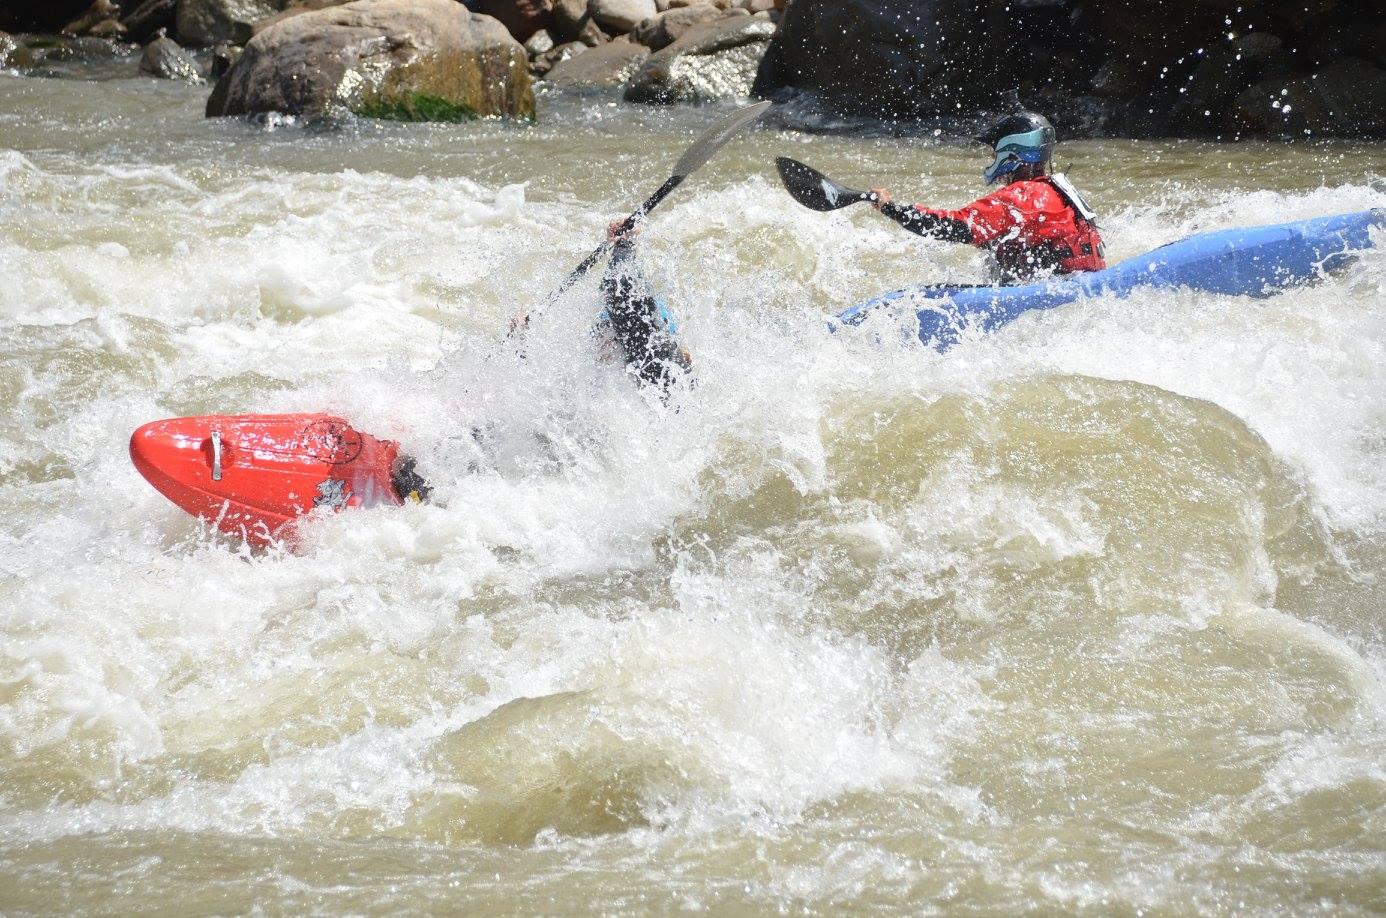 Chasing rivers around the world. Photo: Zaharias De Ugarte